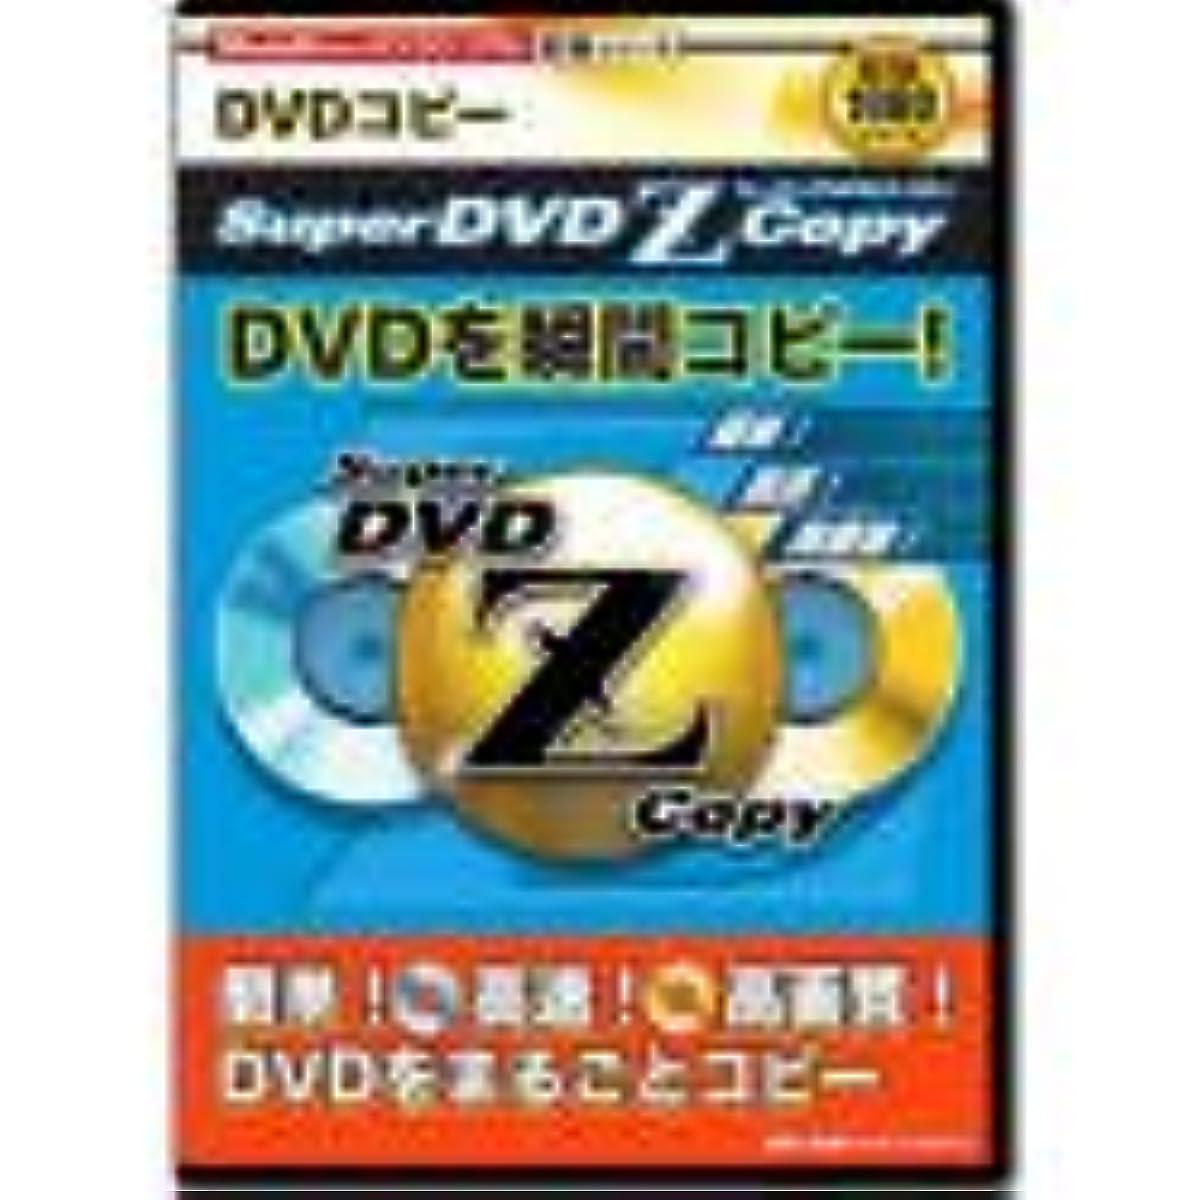 共和党疑い移動Super DVD Z copy